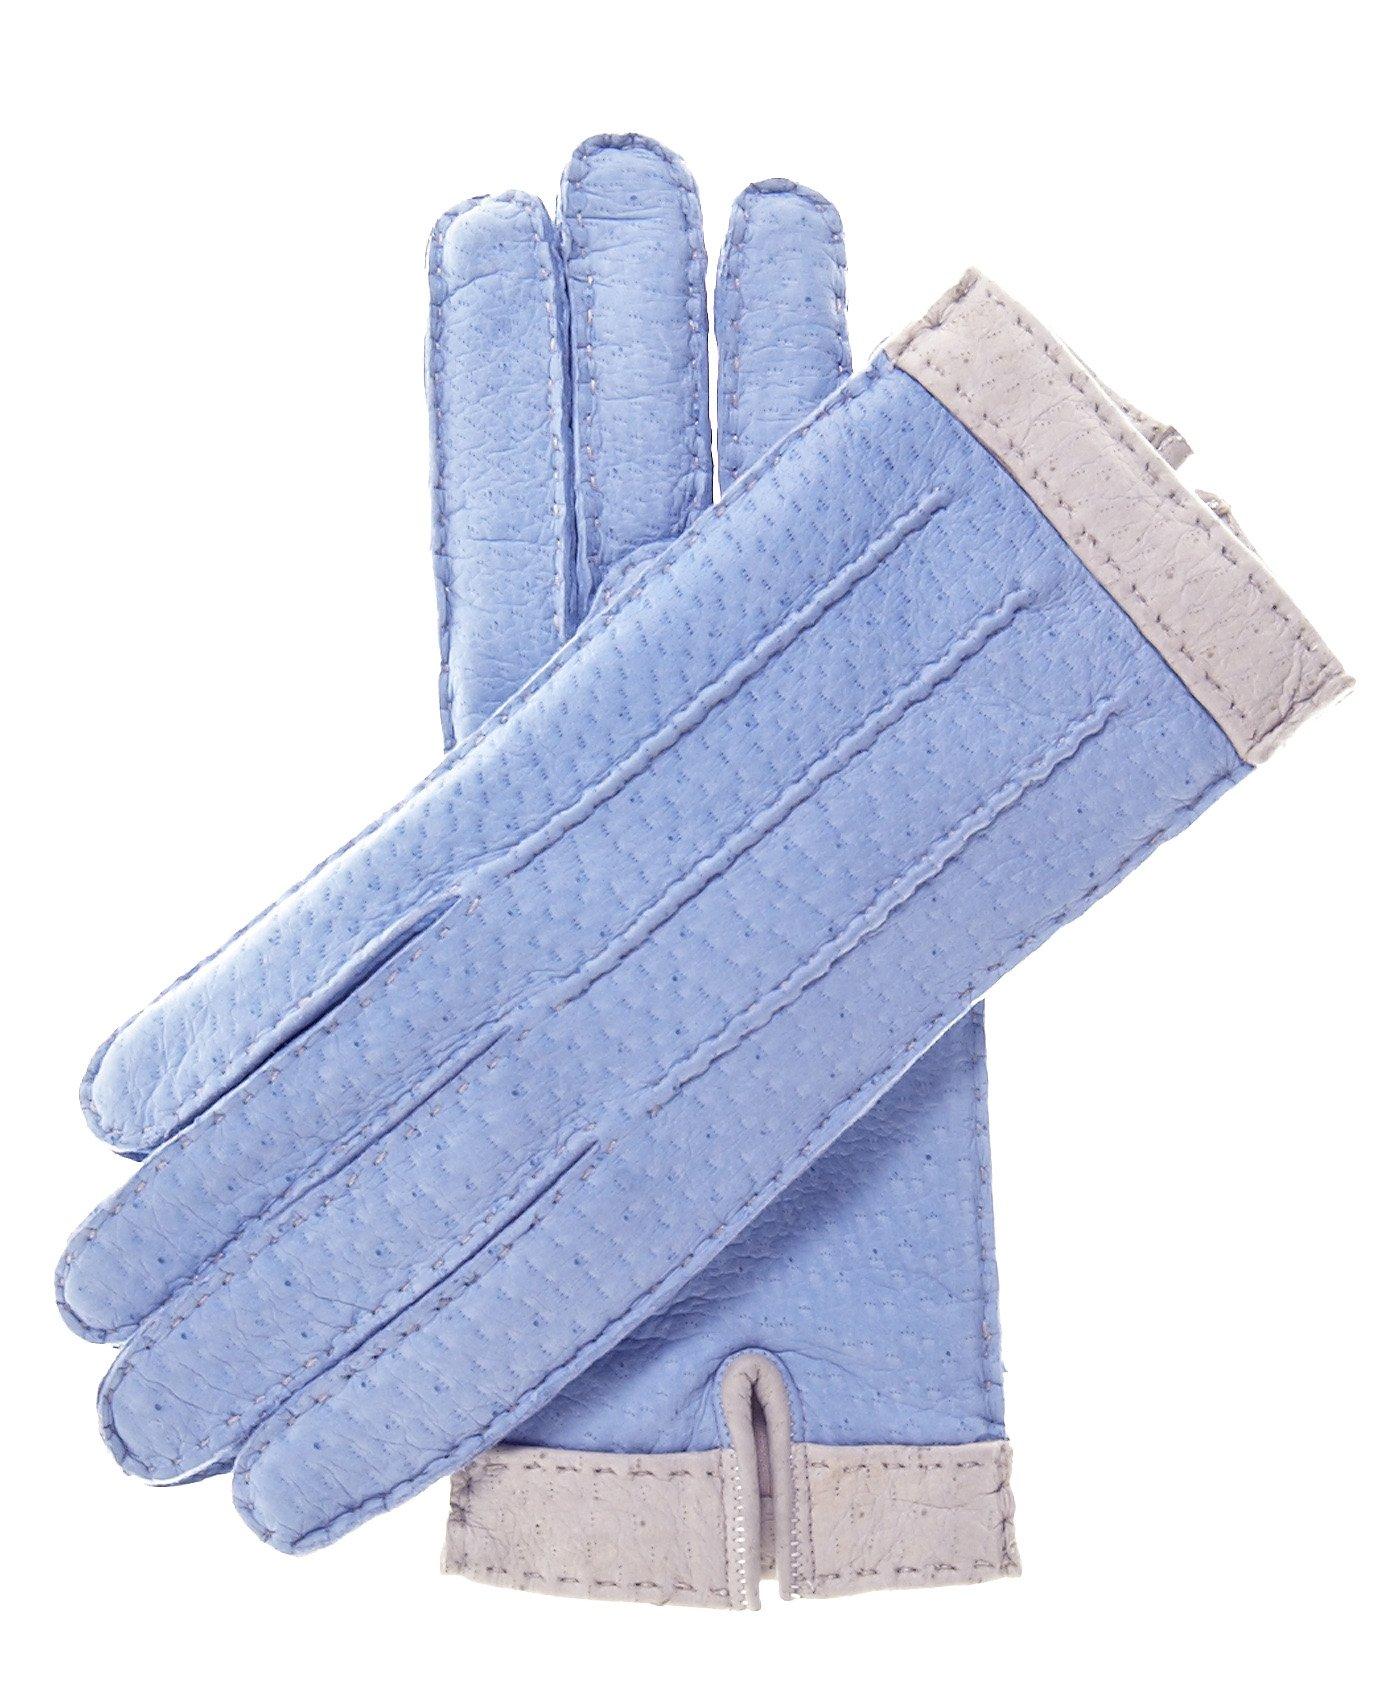 Fratelli Orsini Women's Italian Cashmere Lined Peccary Gloves Size 6 Color Sky